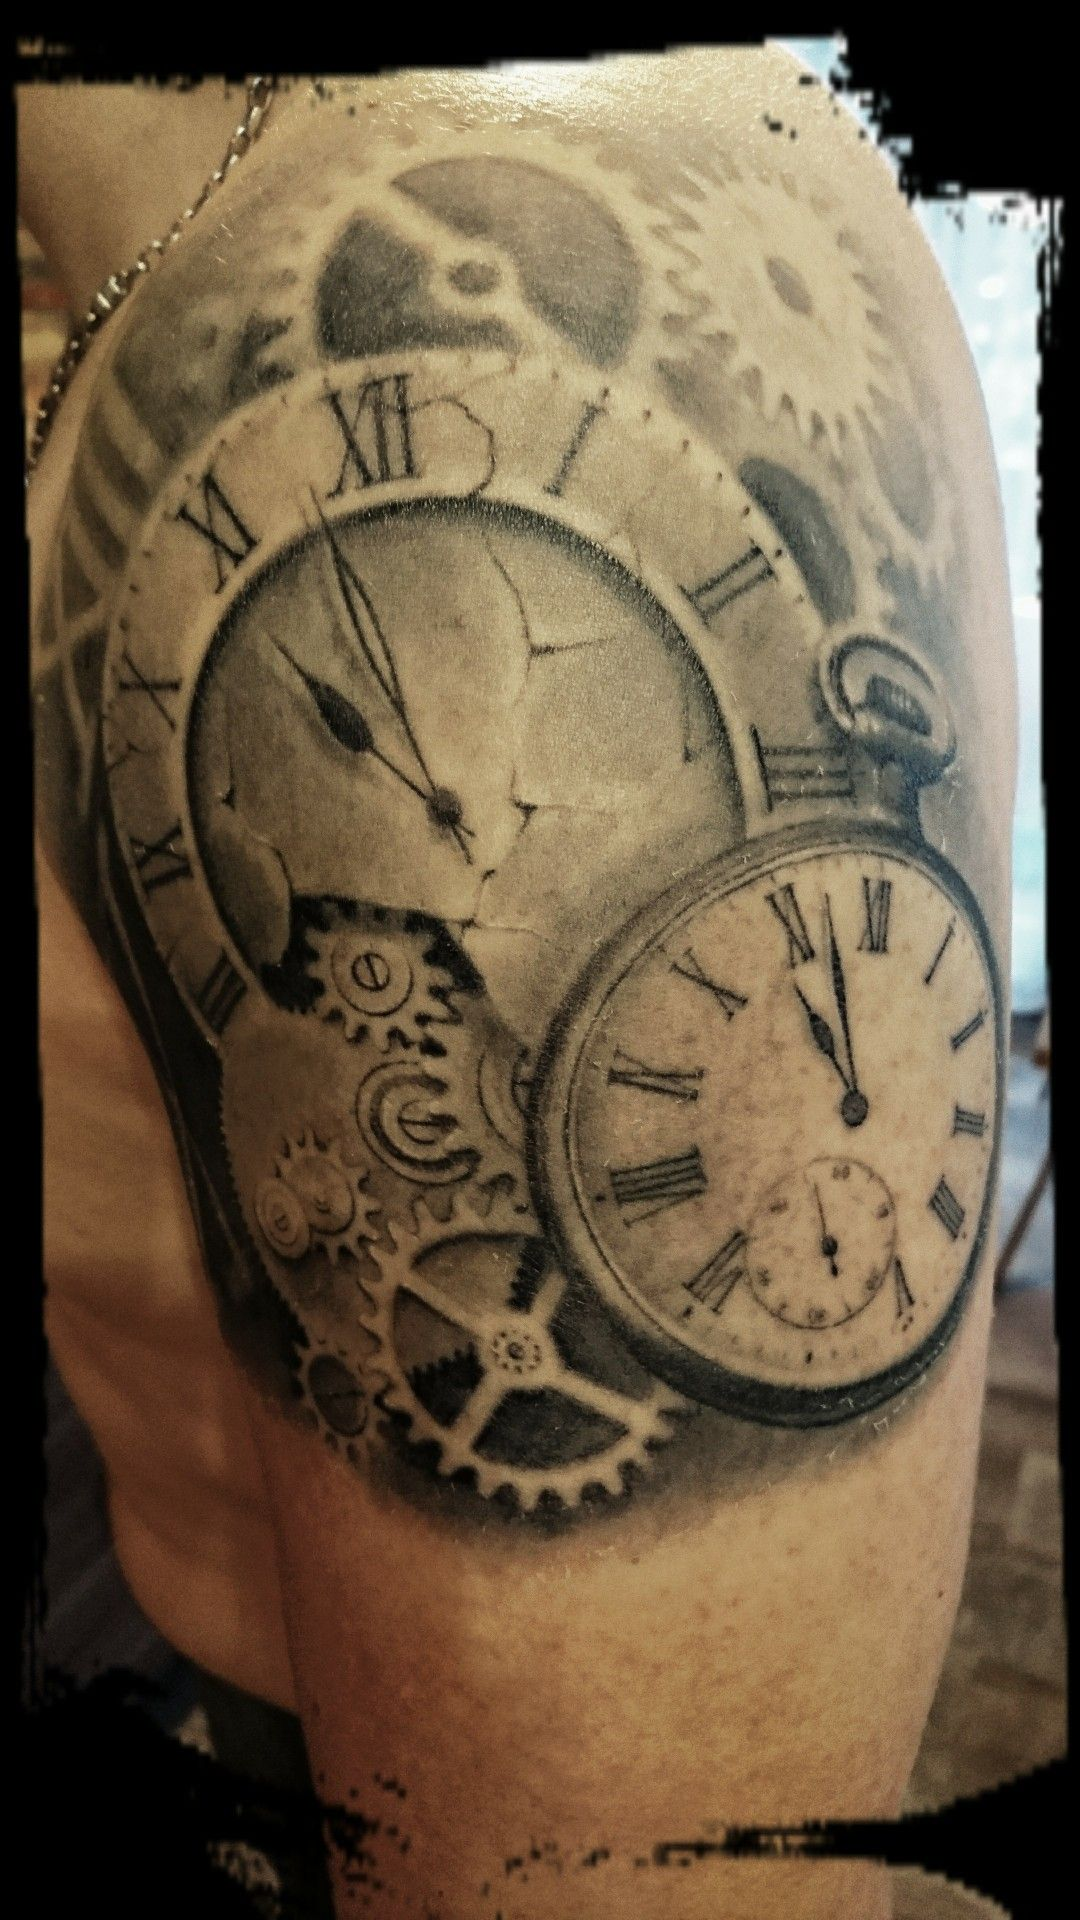 tattoo horloge montre temps tattoo tatouage horloge. Black Bedroom Furniture Sets. Home Design Ideas